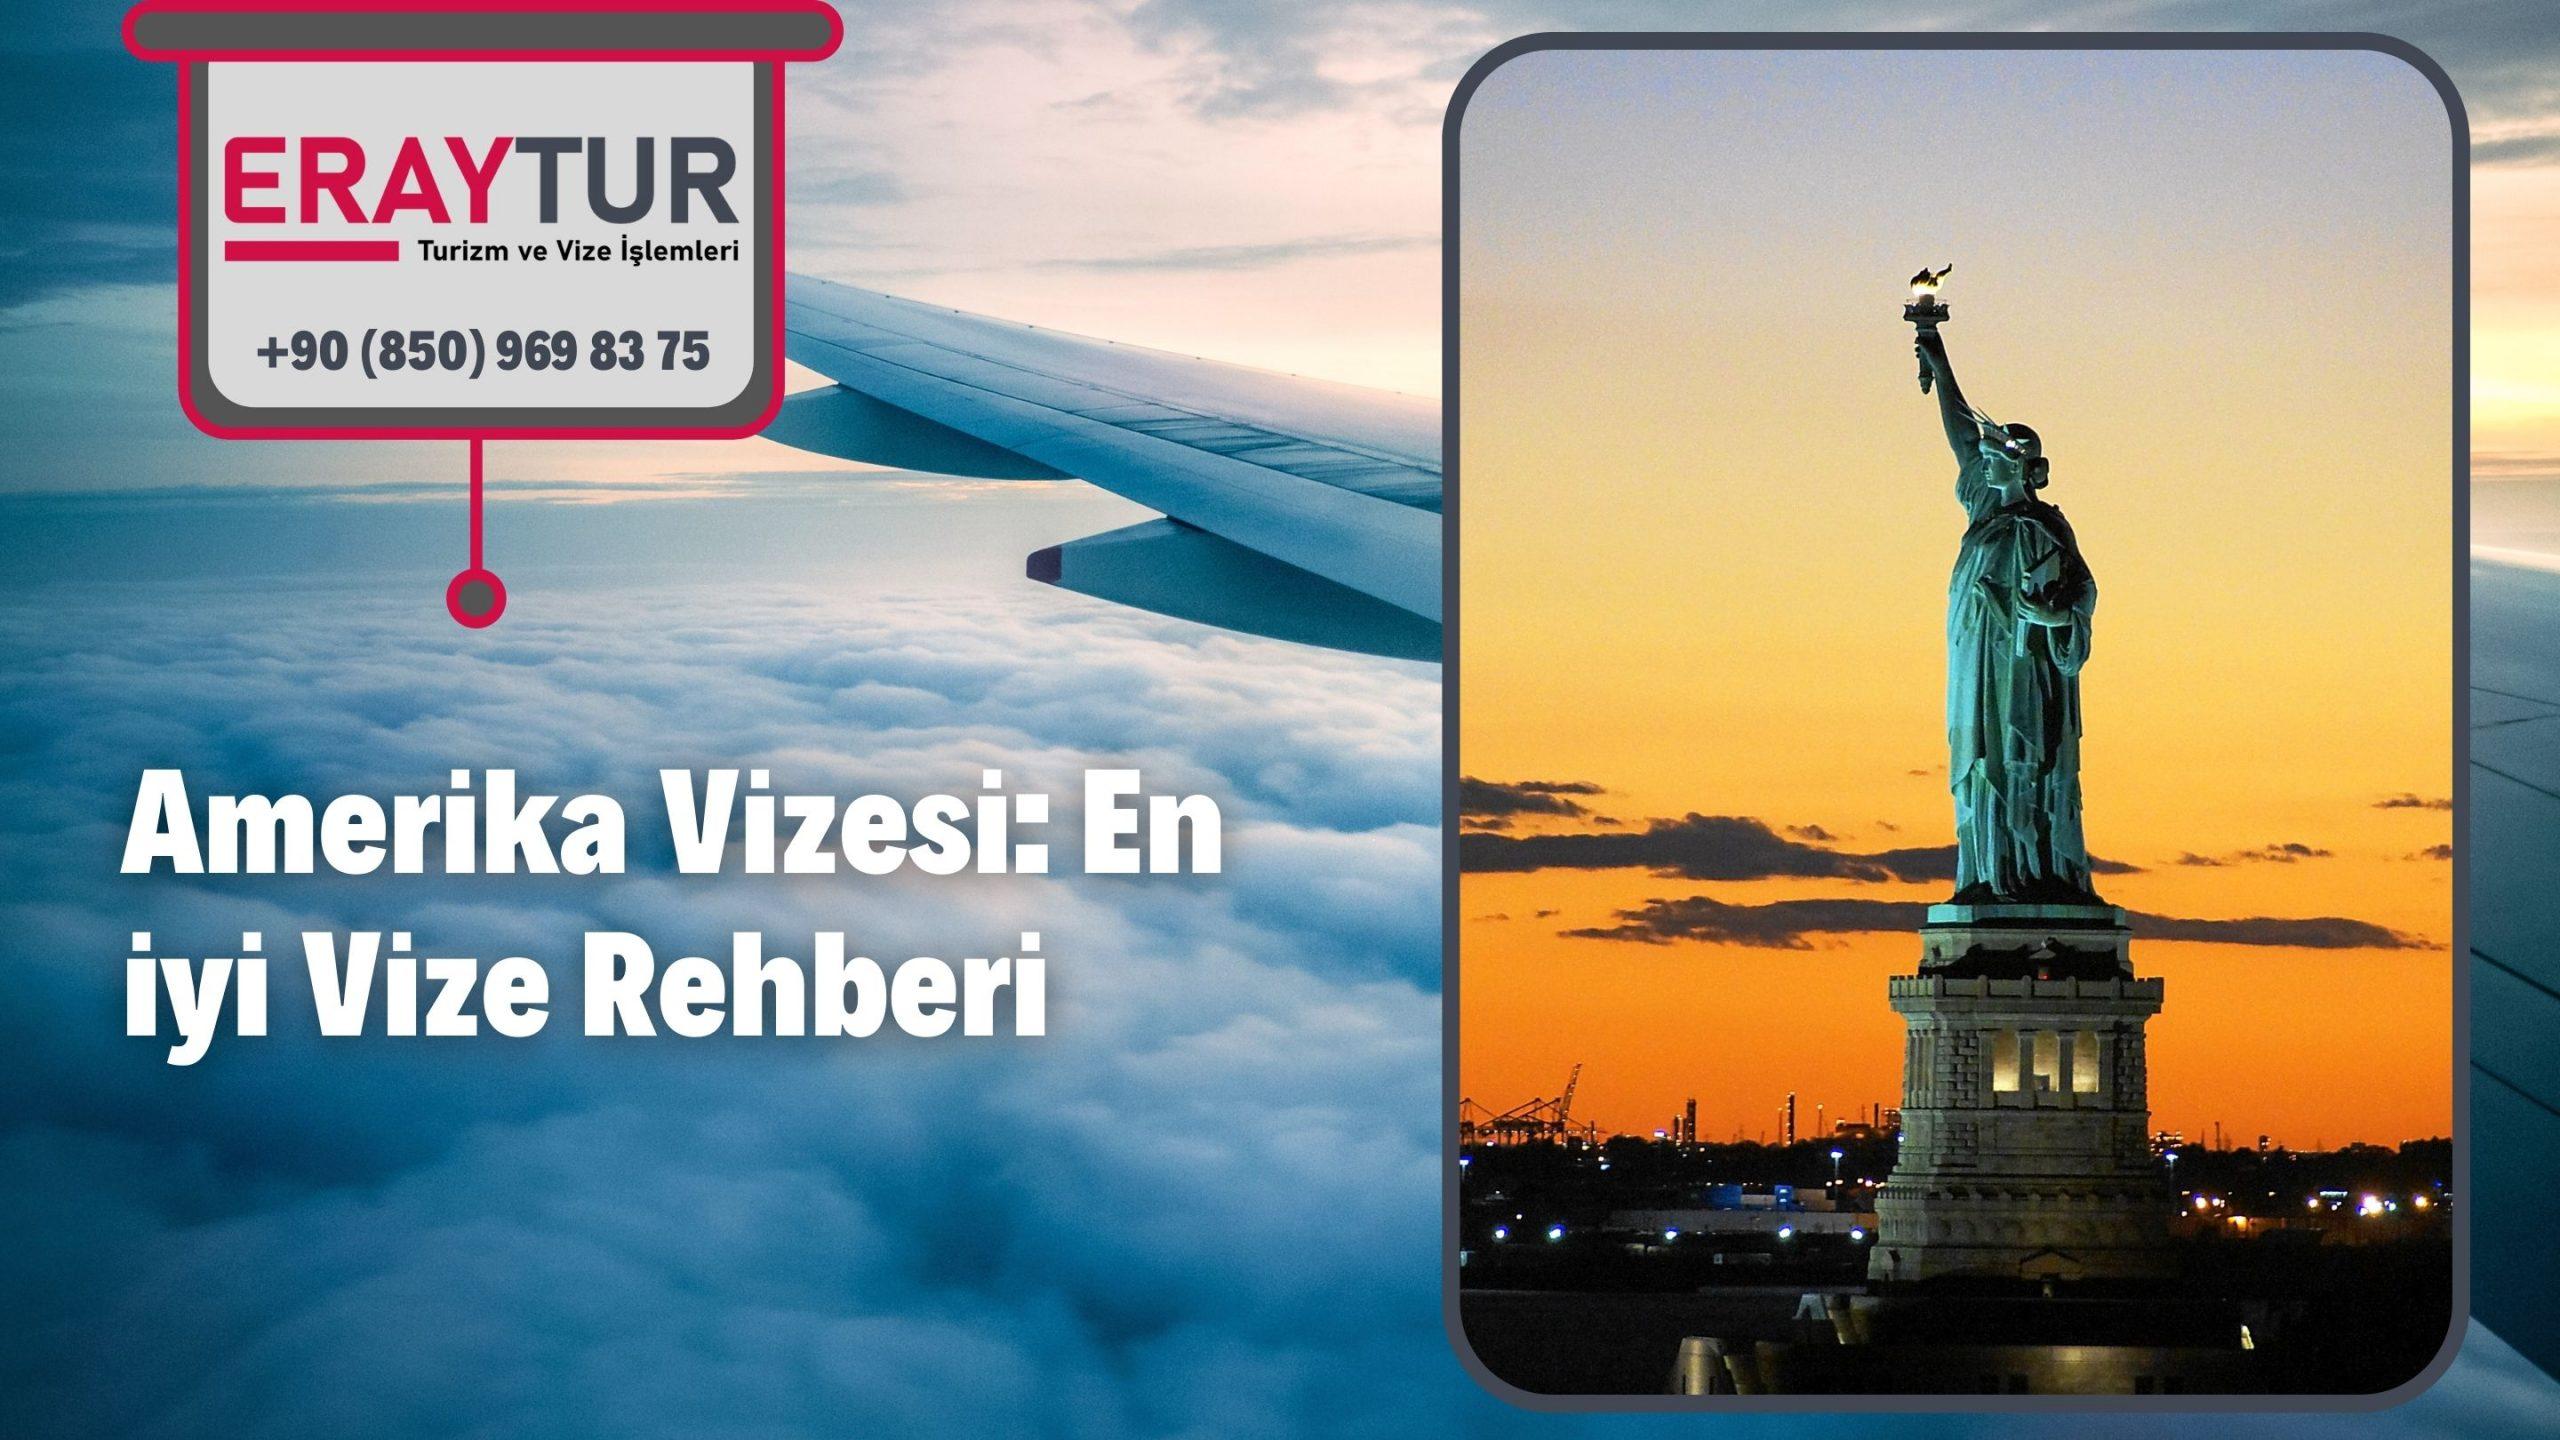 Amerika Vizesi: En iyi Vize Rehberi 2021 1 – amerika vizesi en iyi vize rehberi 2021 1 scaled